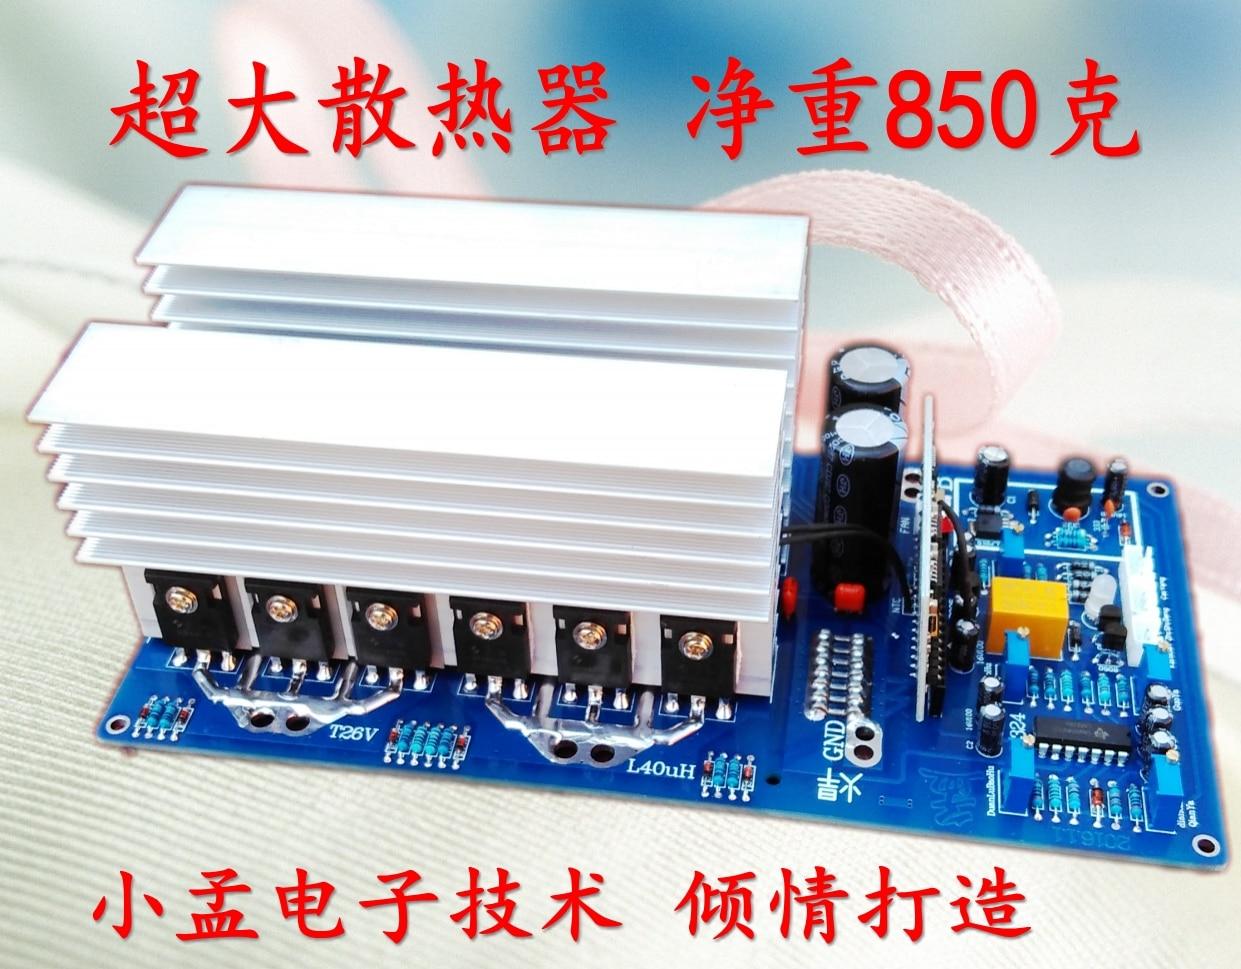 24v 36v 48v 60v 1kw To 5kw Pure Sine Wave Power Frequency Inverter How Make A Homemade 2000 Va Circuit Electronic 3kva 4kva 5kva 6kva Board